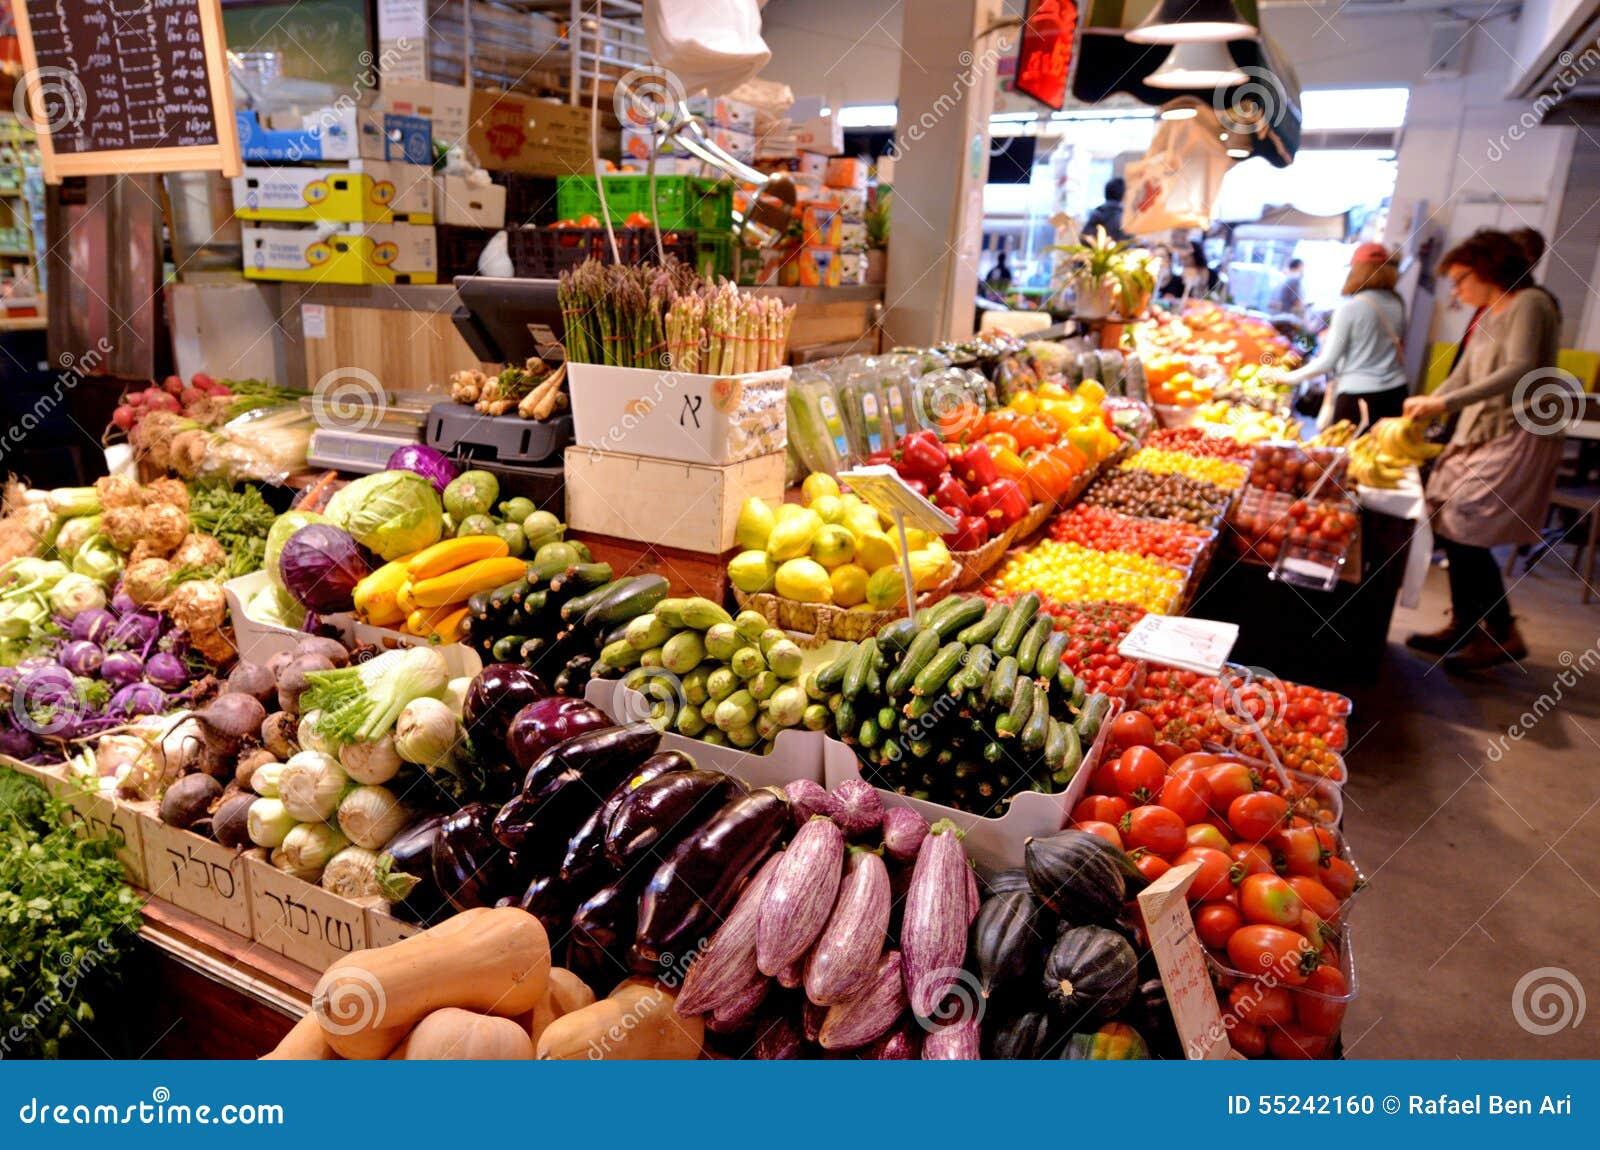 Tel Aviv Prices Food